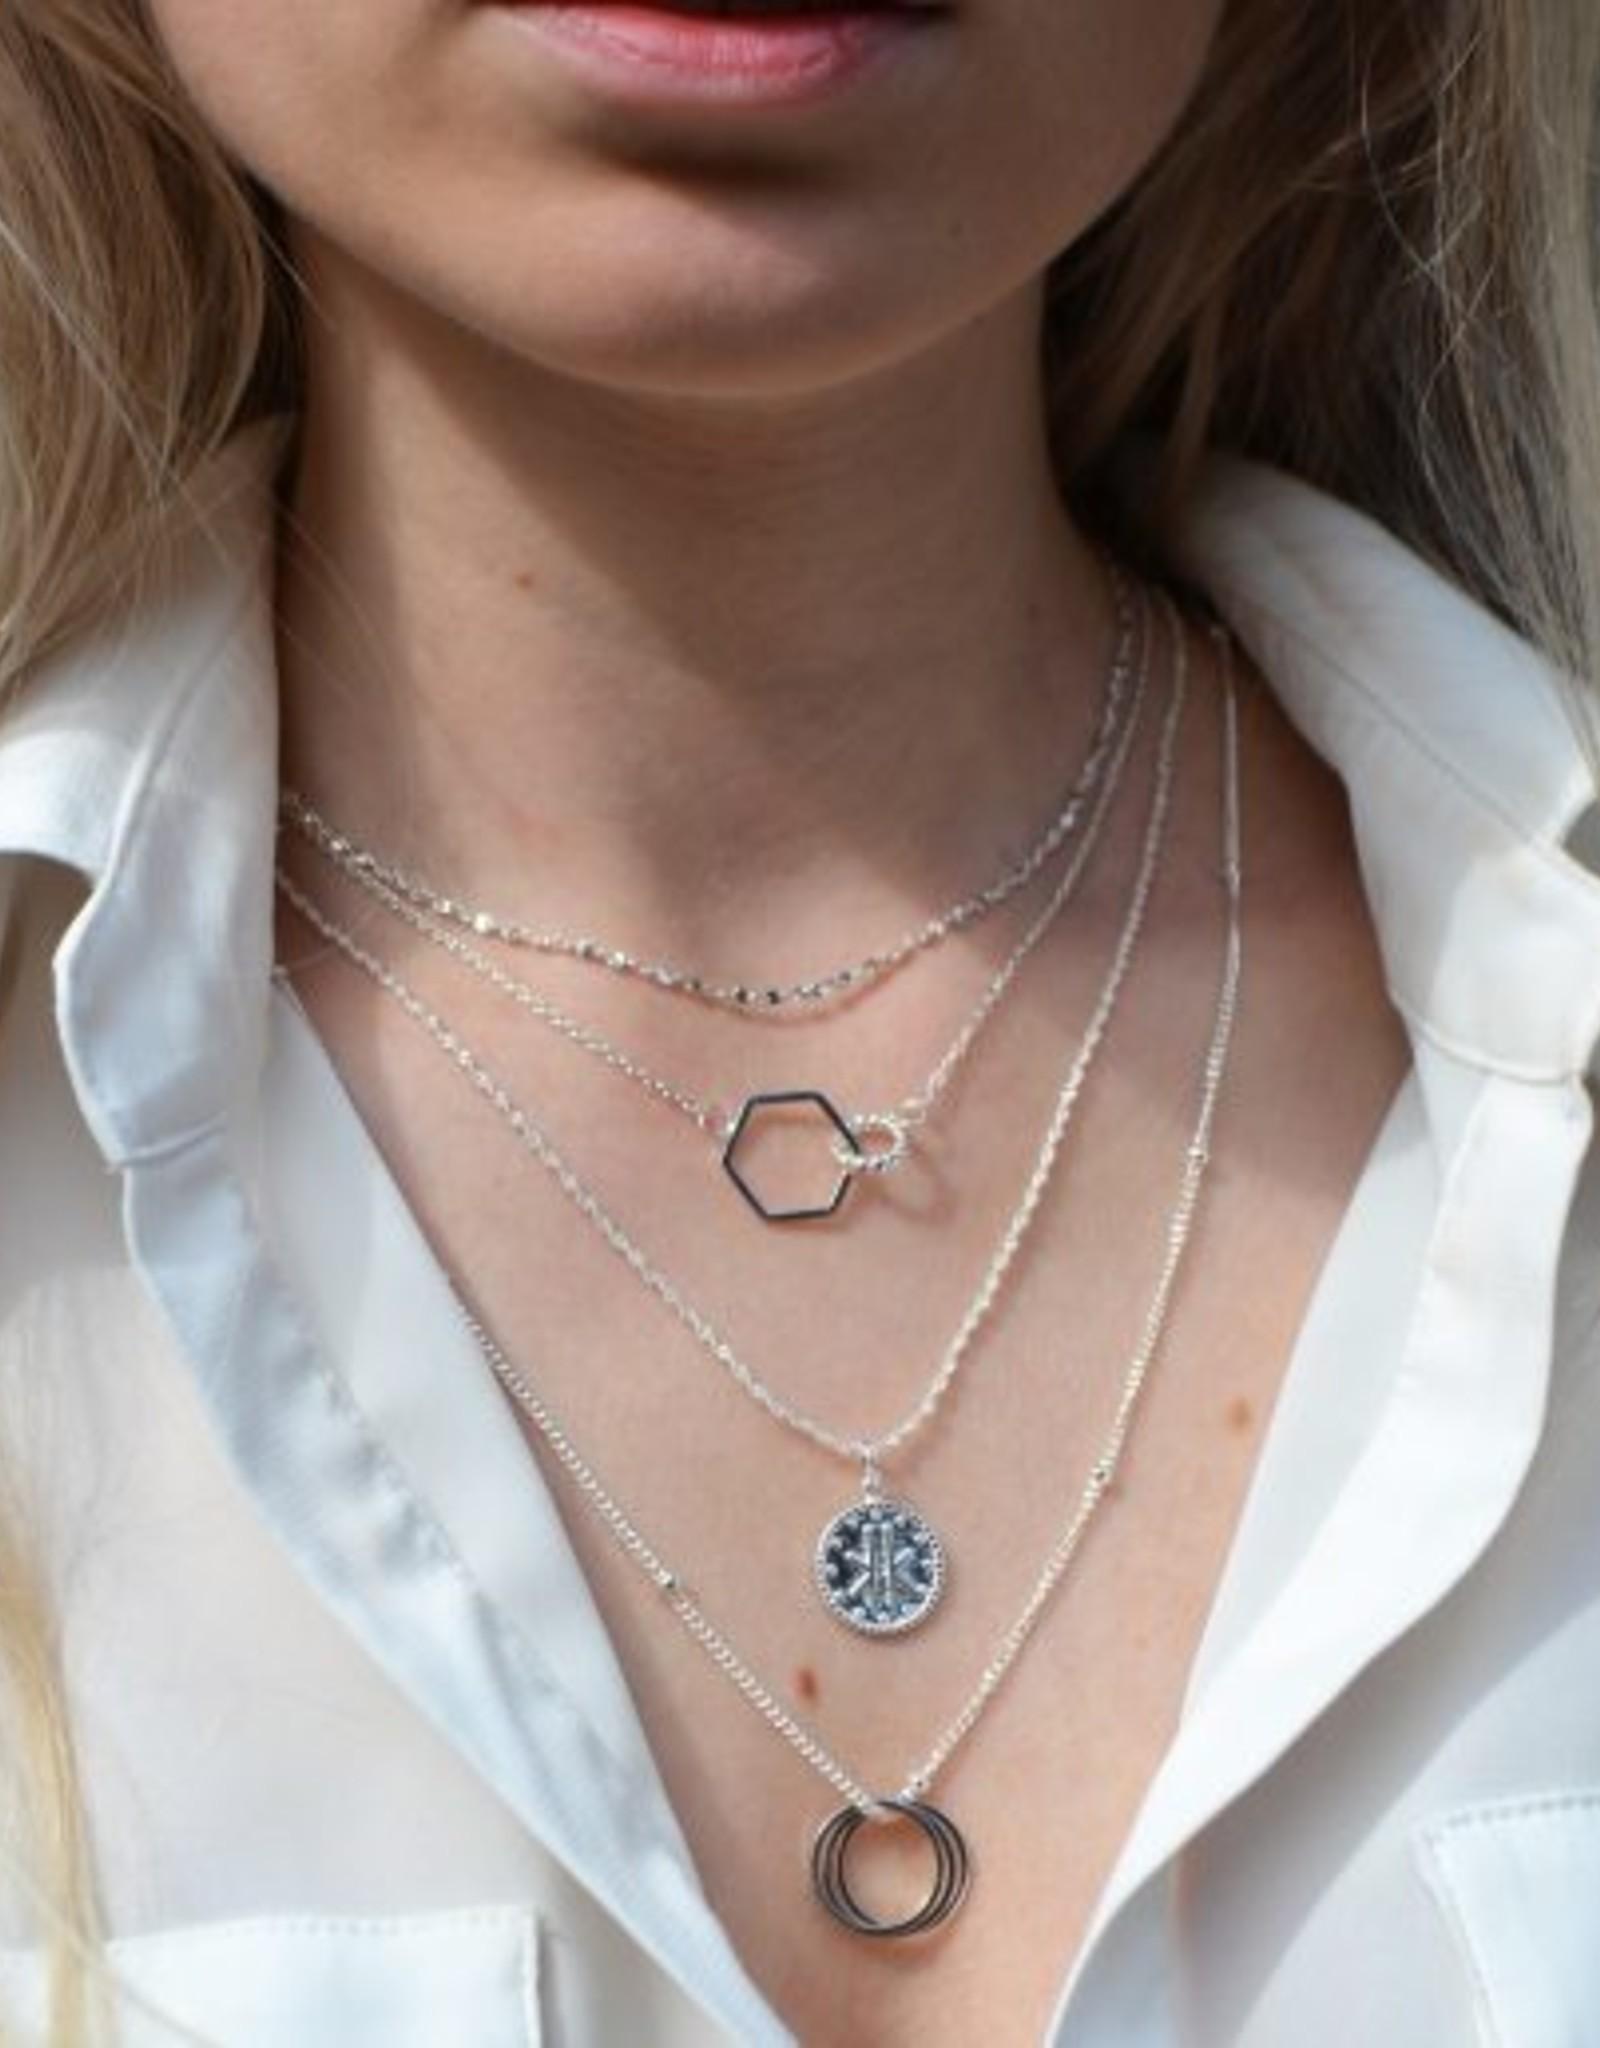 Label kiki label kiki Rewind necklace silver